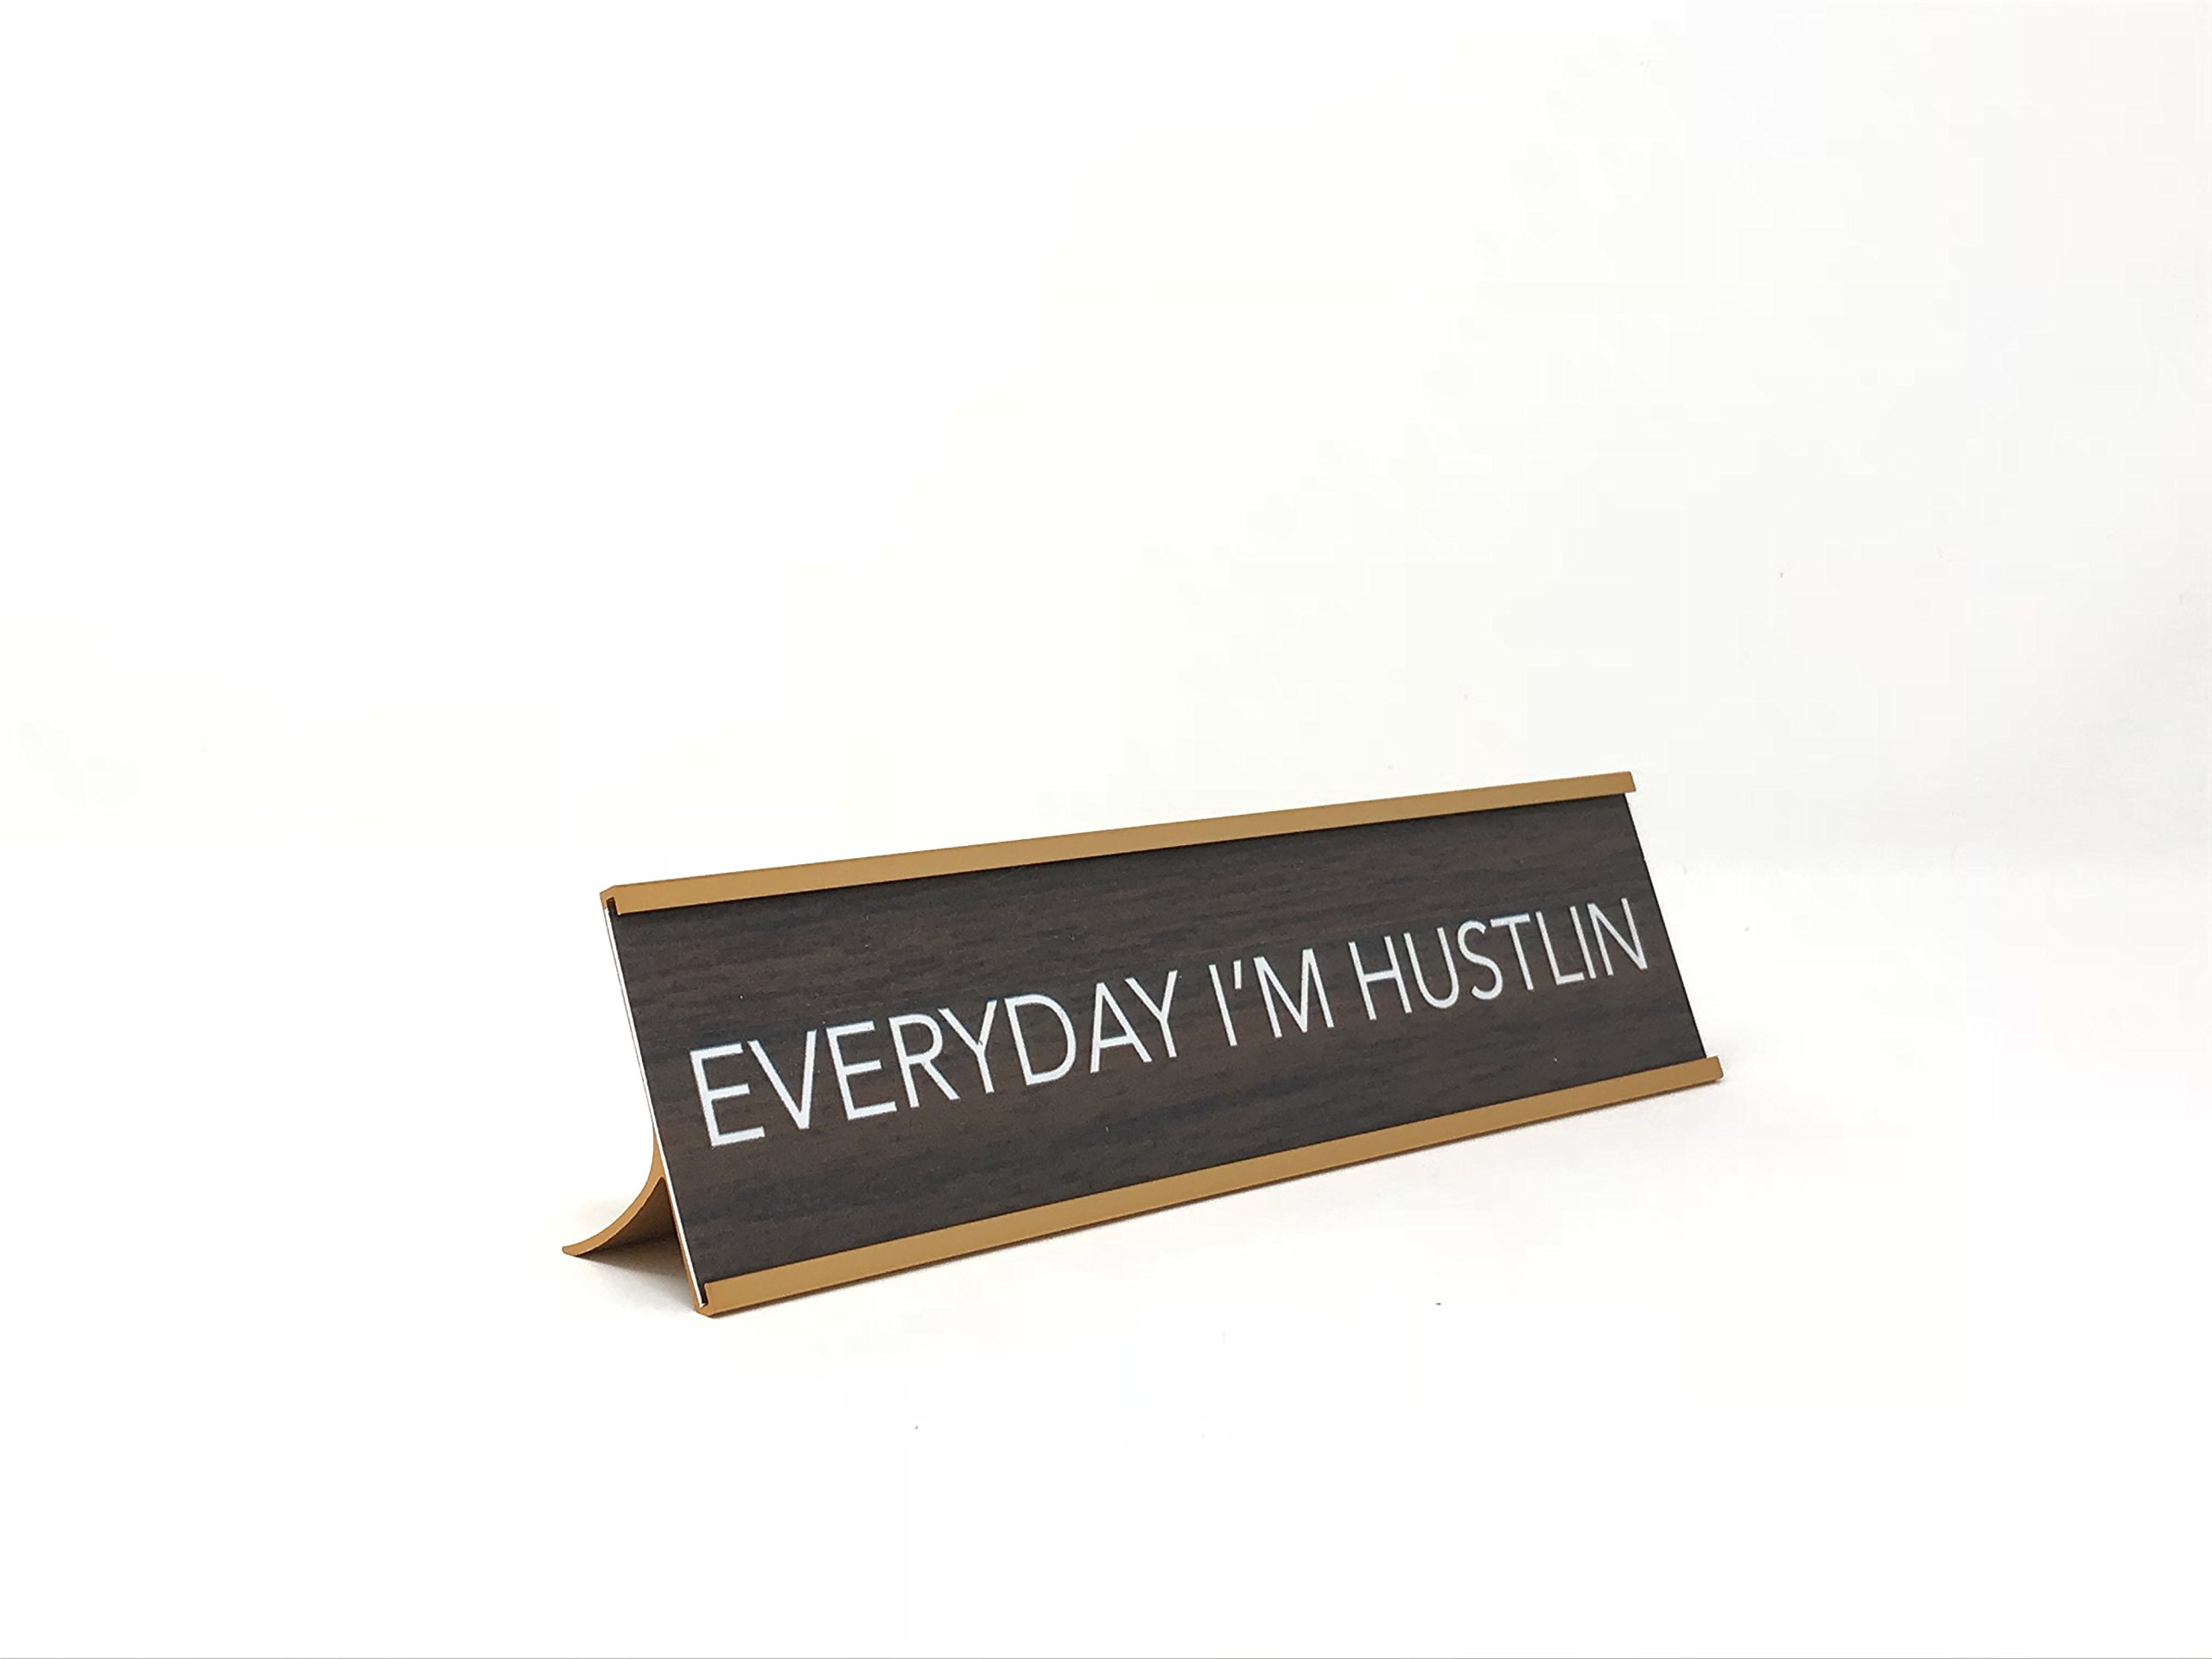 Aahs Engraving Everyday I'm Hustlin Novelty Nameplate Style Desk Sign (Brown)